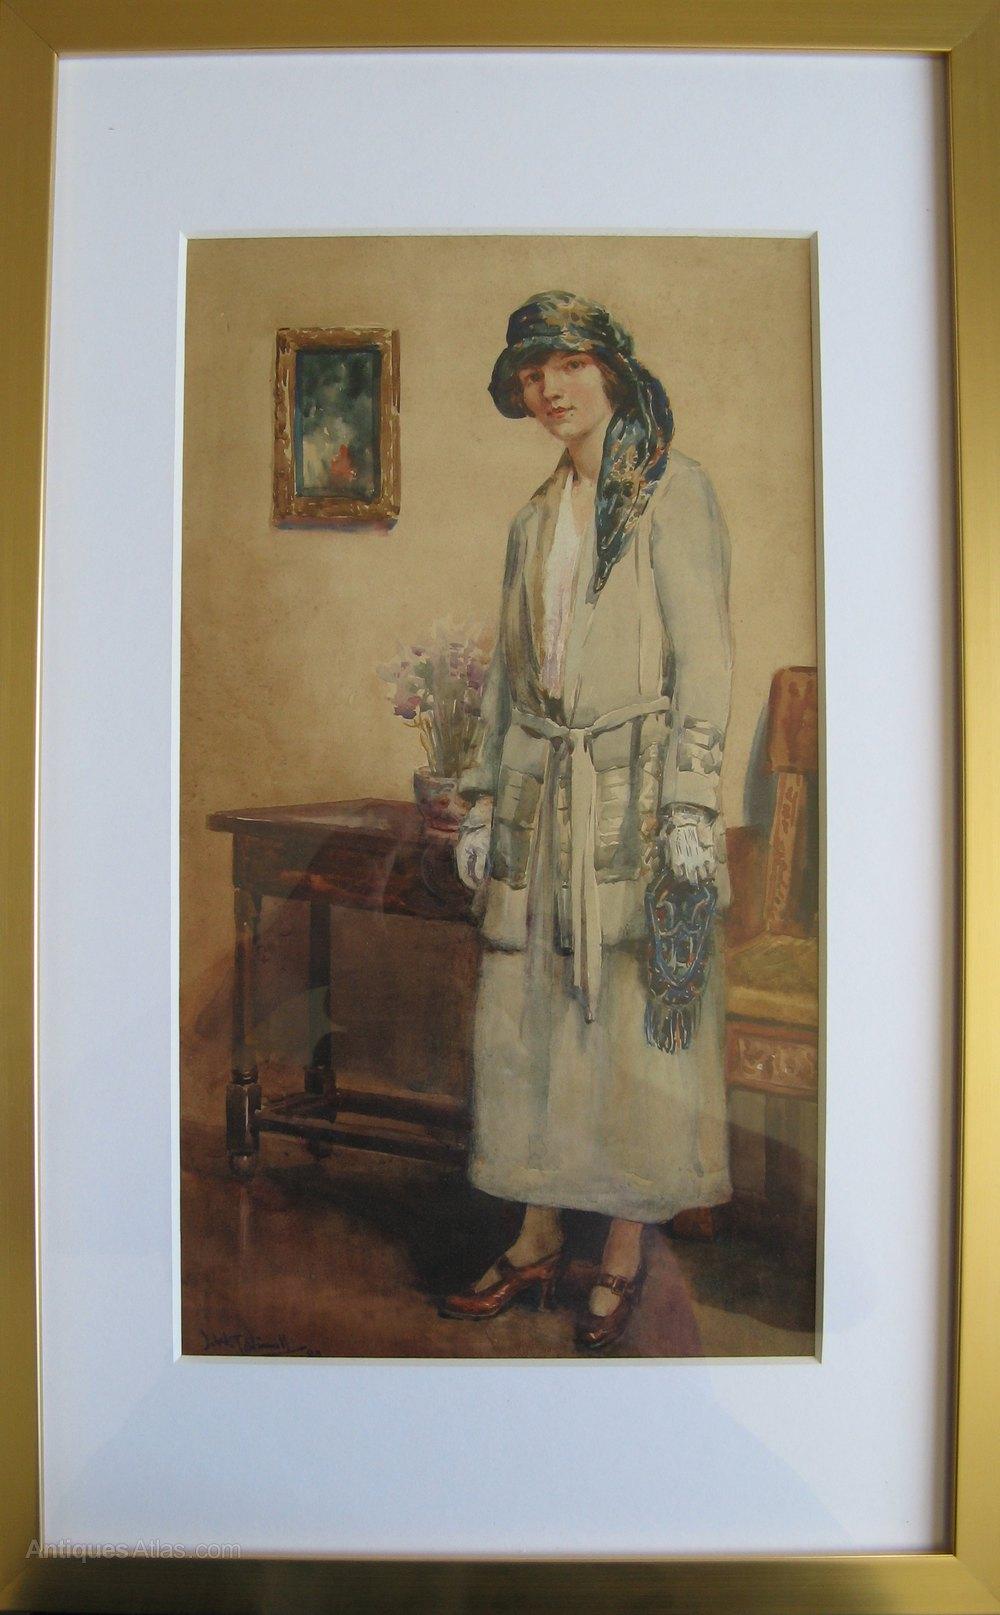 Antiques Atlas - Early Art Deco Watercolour JWT Vinall 1873-1953